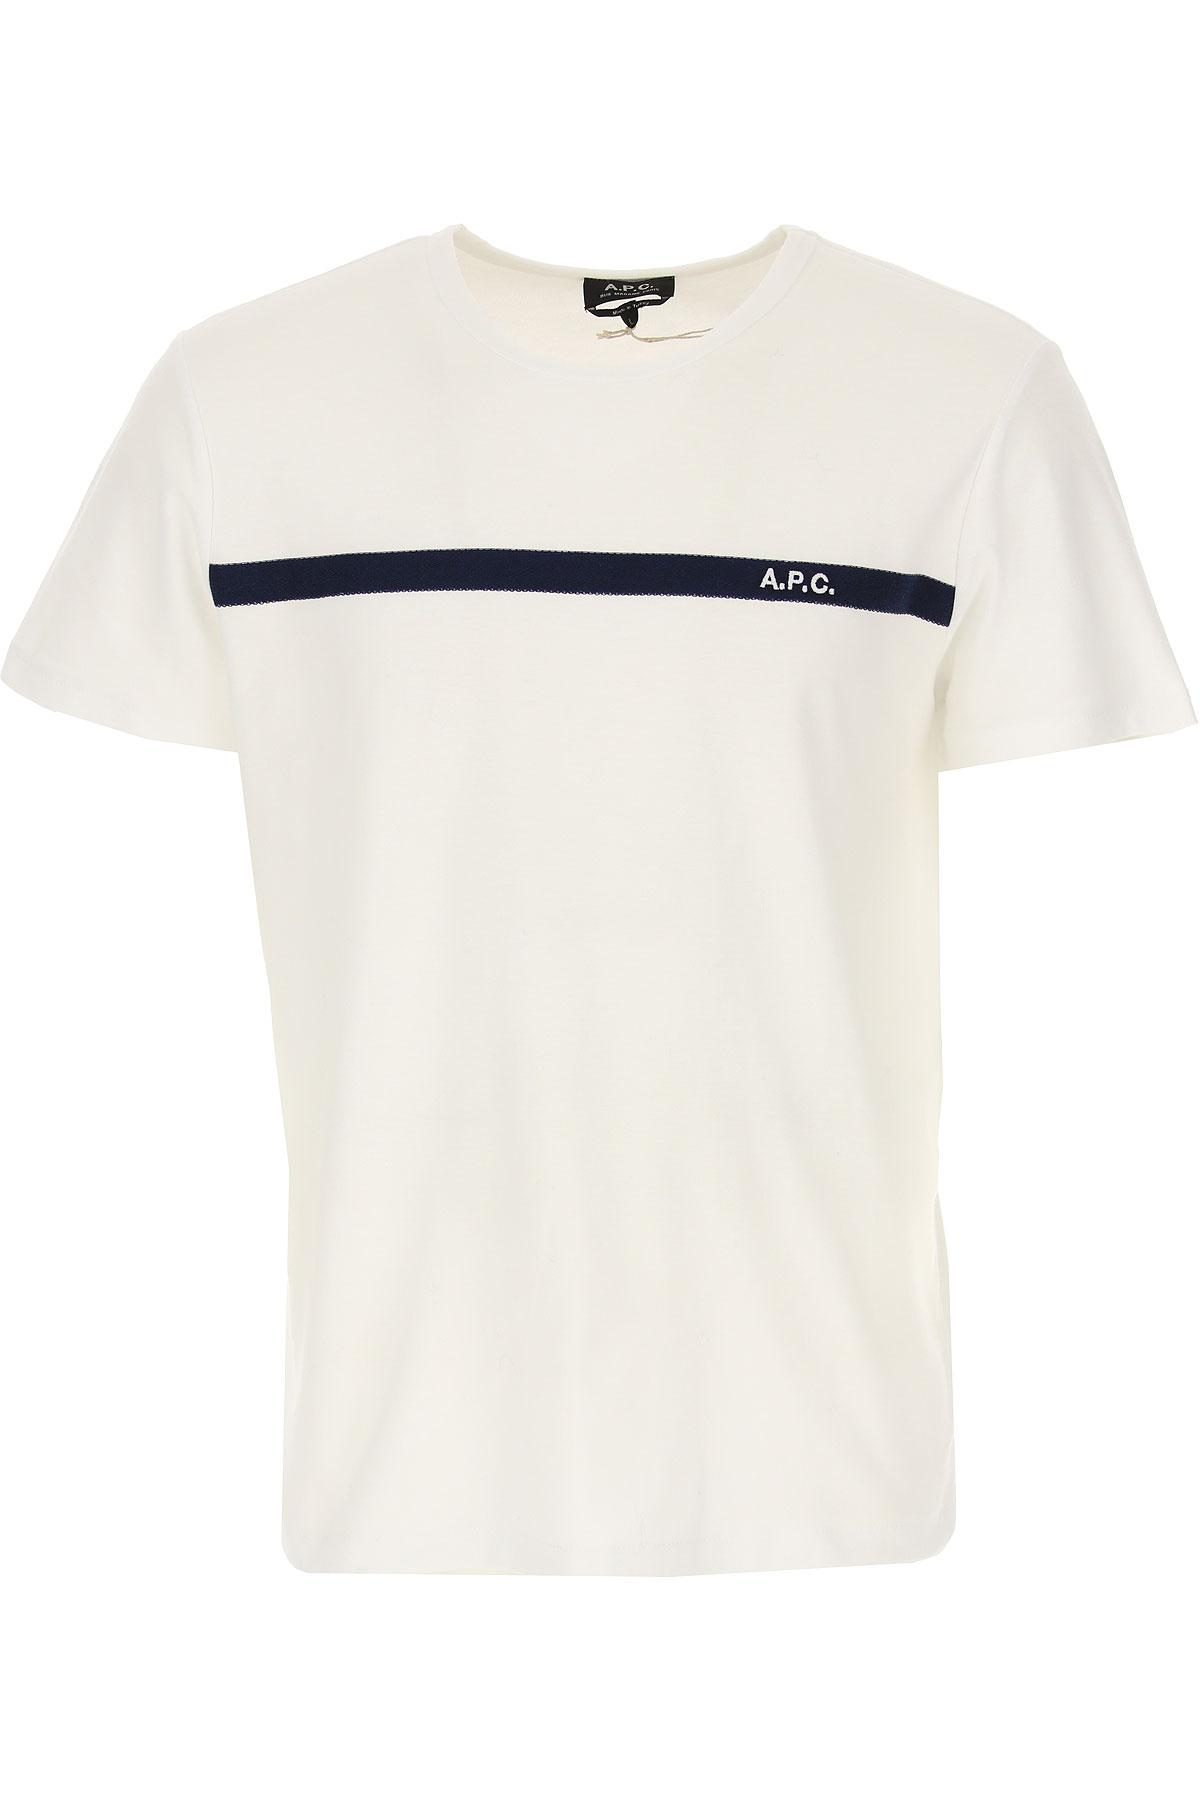 A.P.C T-Shirt for Men On Sale, White, Cotton, 2019, L M S